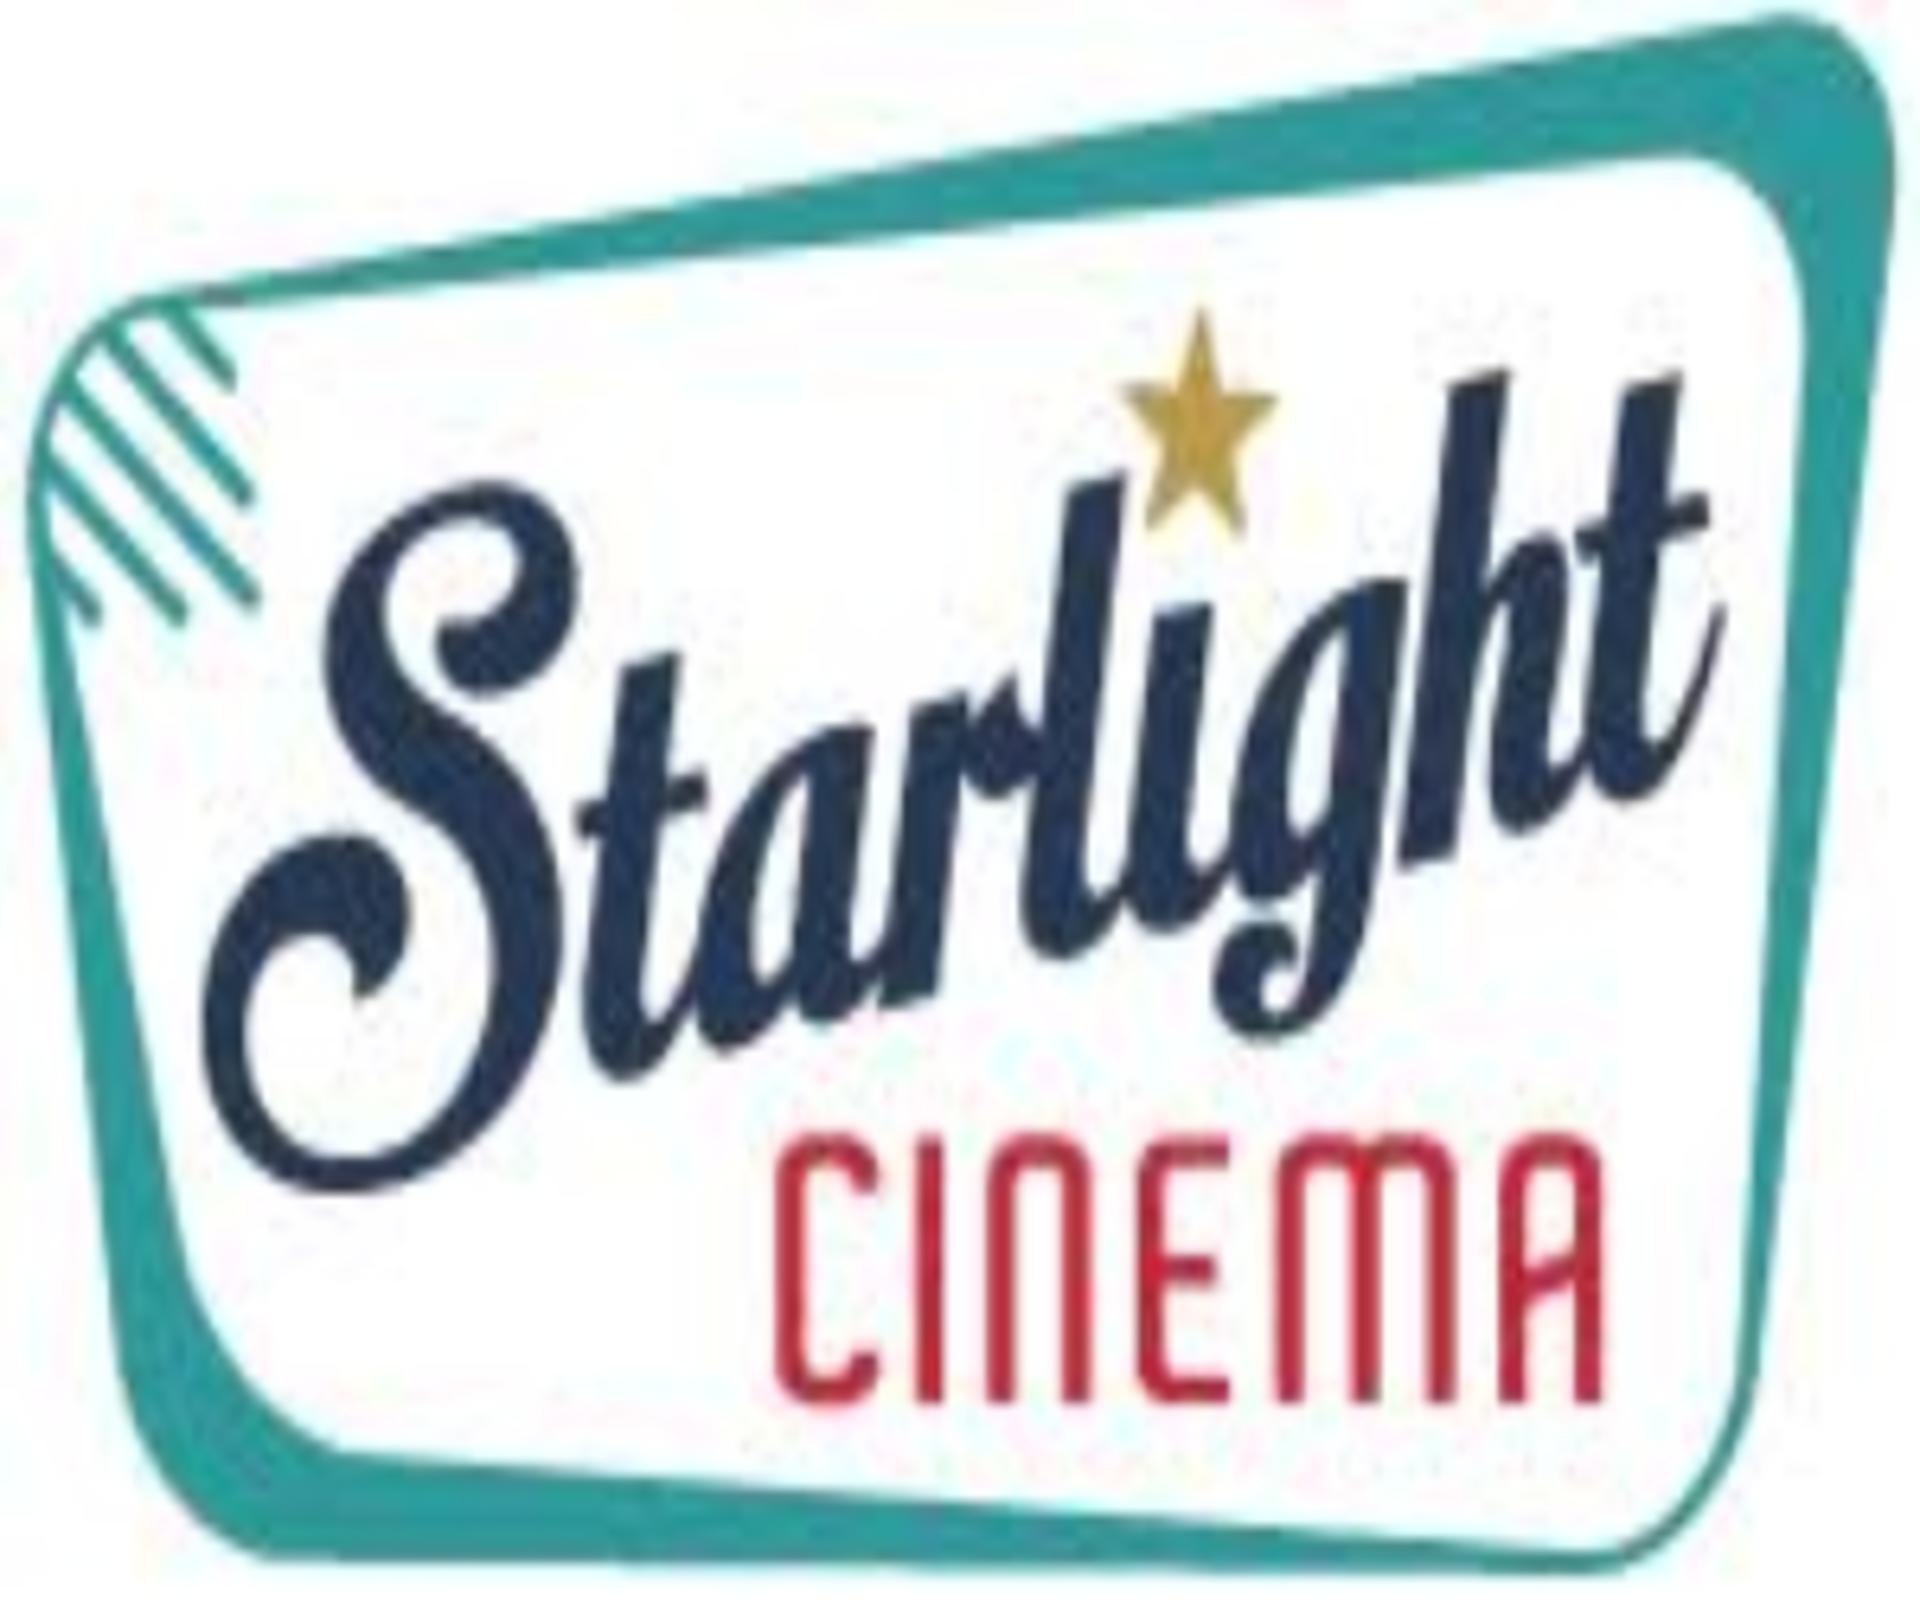 Anew Invitation to Starlight Cinema